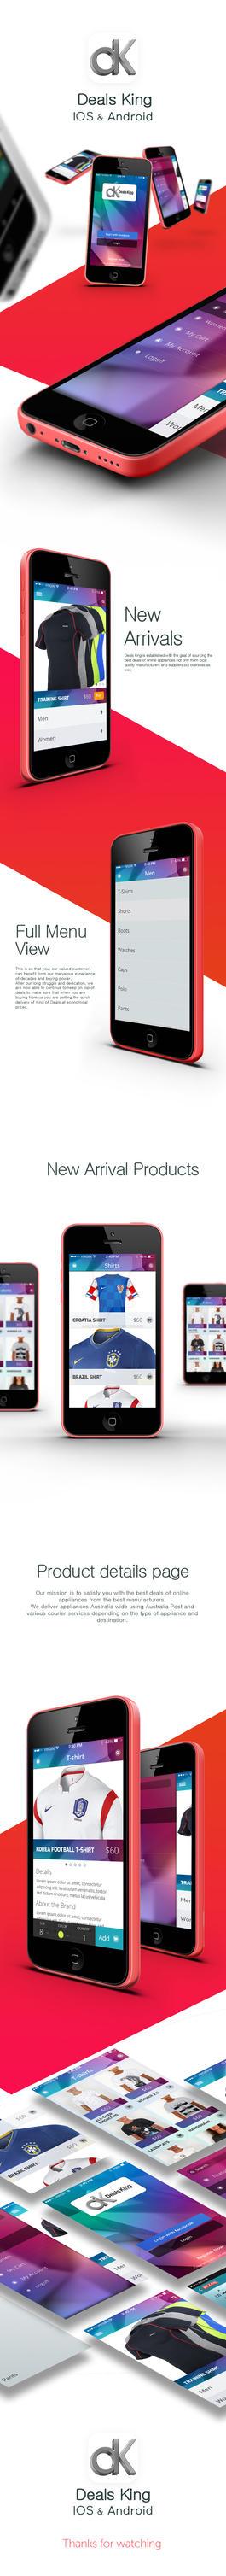 Online store mobile app design by fahadaman91 on deviantart for Shop mobili online